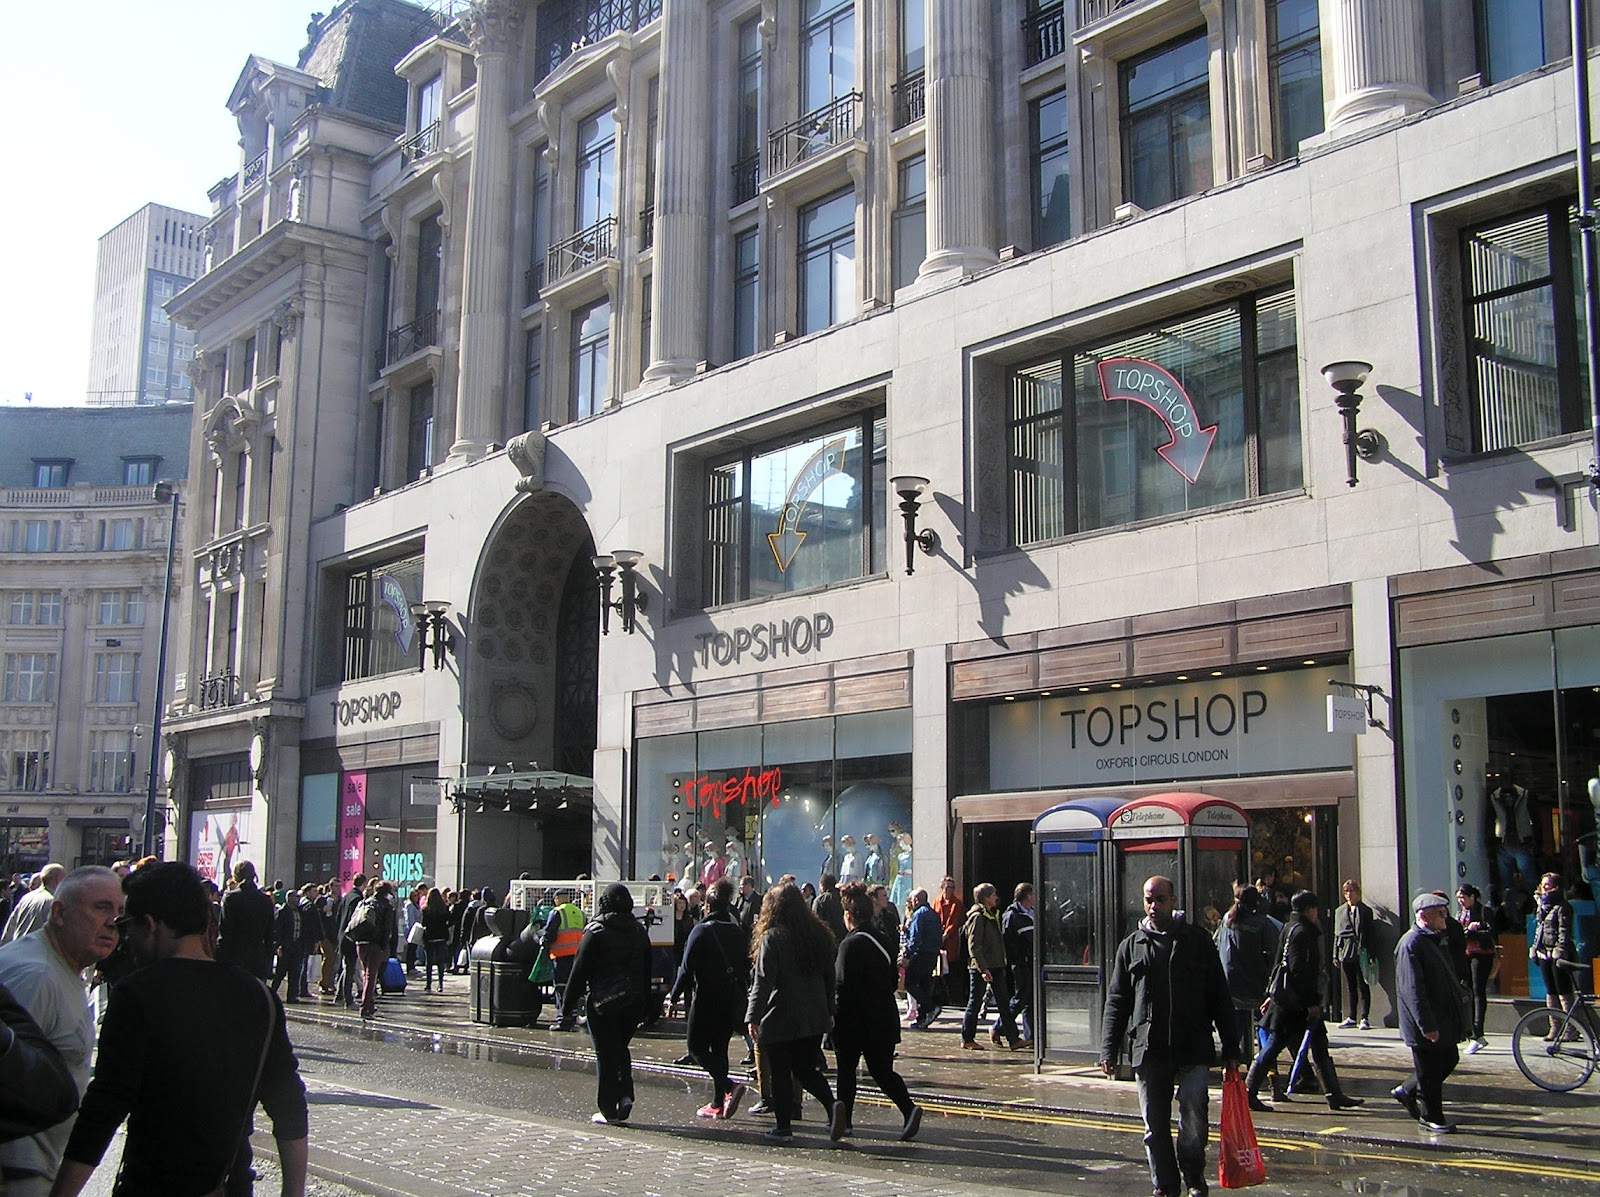 London top shops in oxford st carnaby regent st and picadilly londres tiendas en oxford - Bershka en londres ...